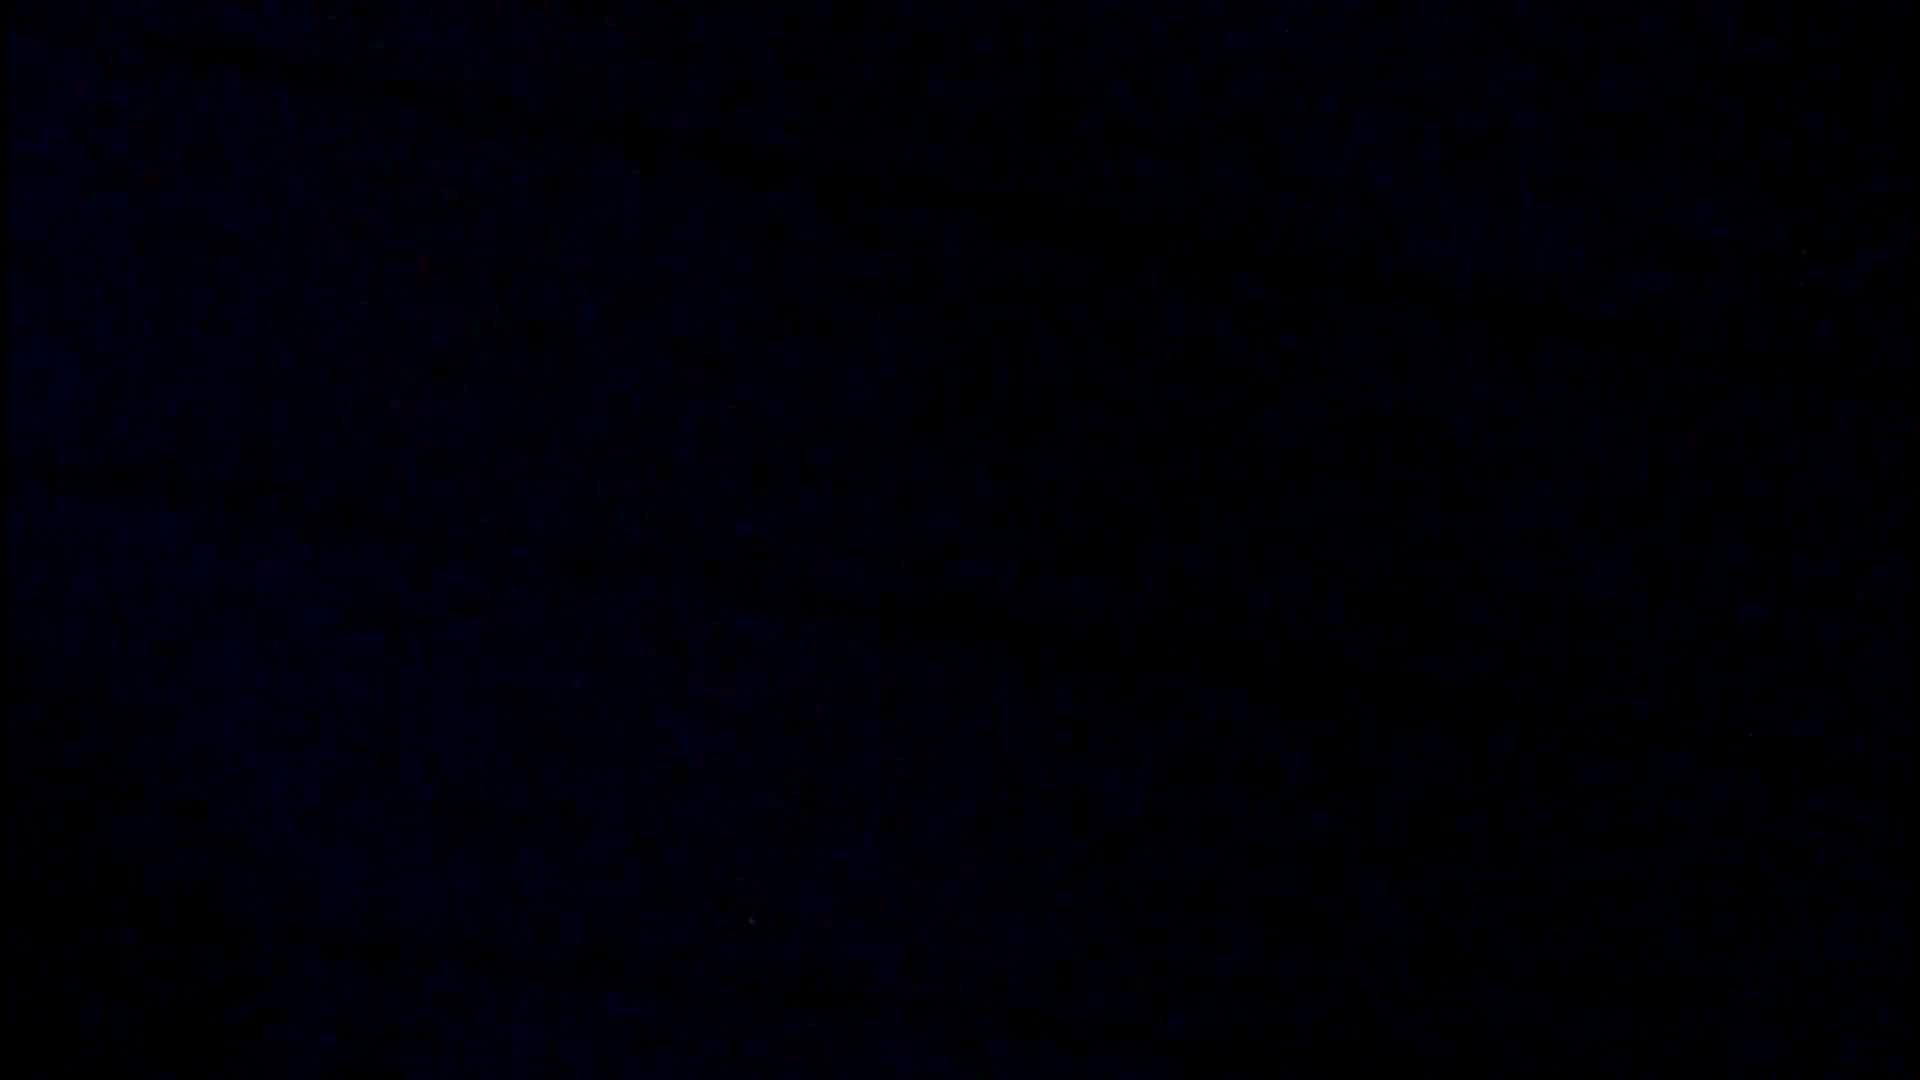 SPYさん初投稿!マンション覗き!5000K!ハイビジョン撮影VOL.04(現役ラグビー部大学生編) 投稿 ゲイアダルトビデオ画像 74枚 54